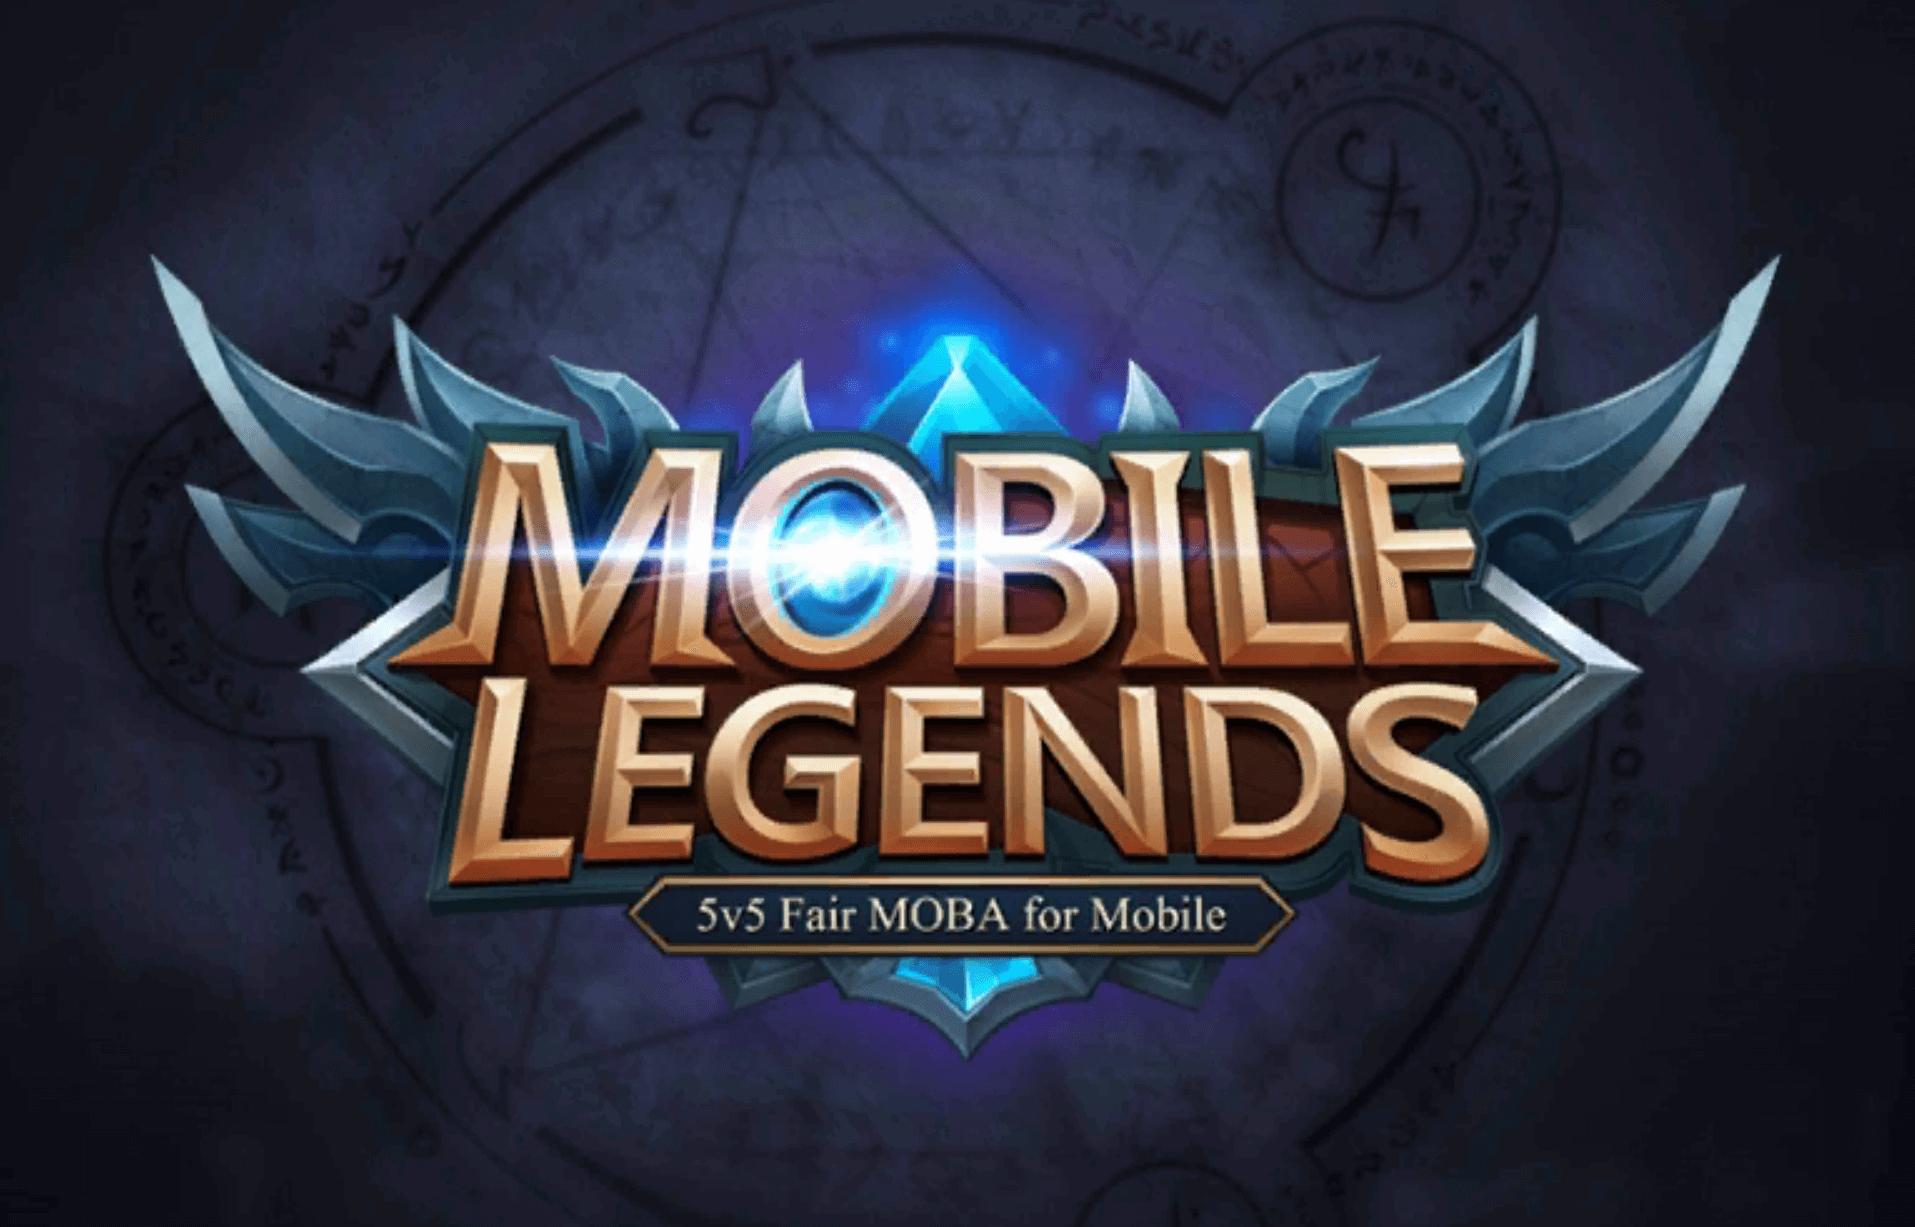 Cara mengatasi reconnect mobile legend,cara mengatasi mobile legend gagal log